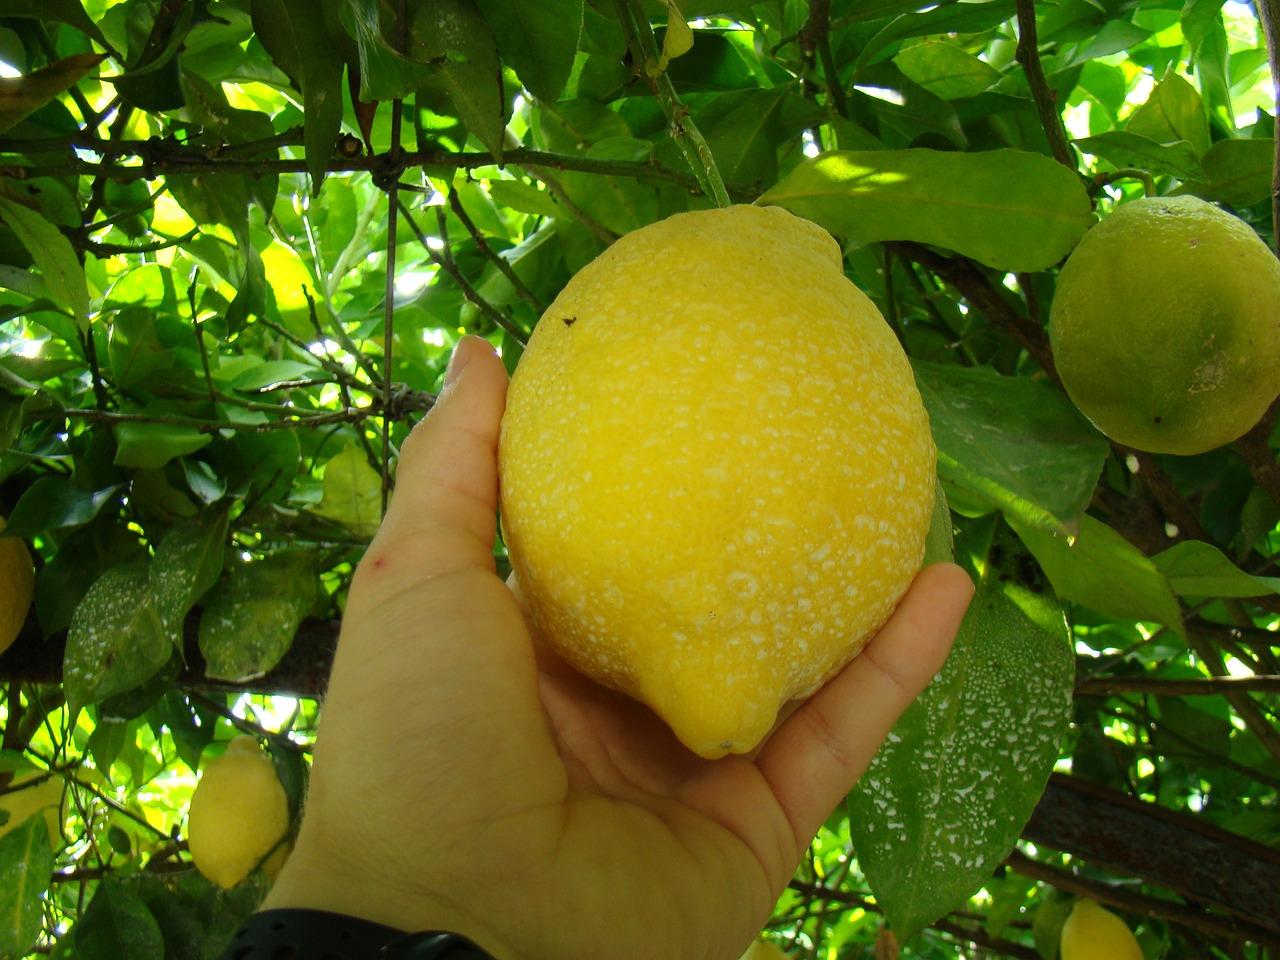 Картинка или фото лимона